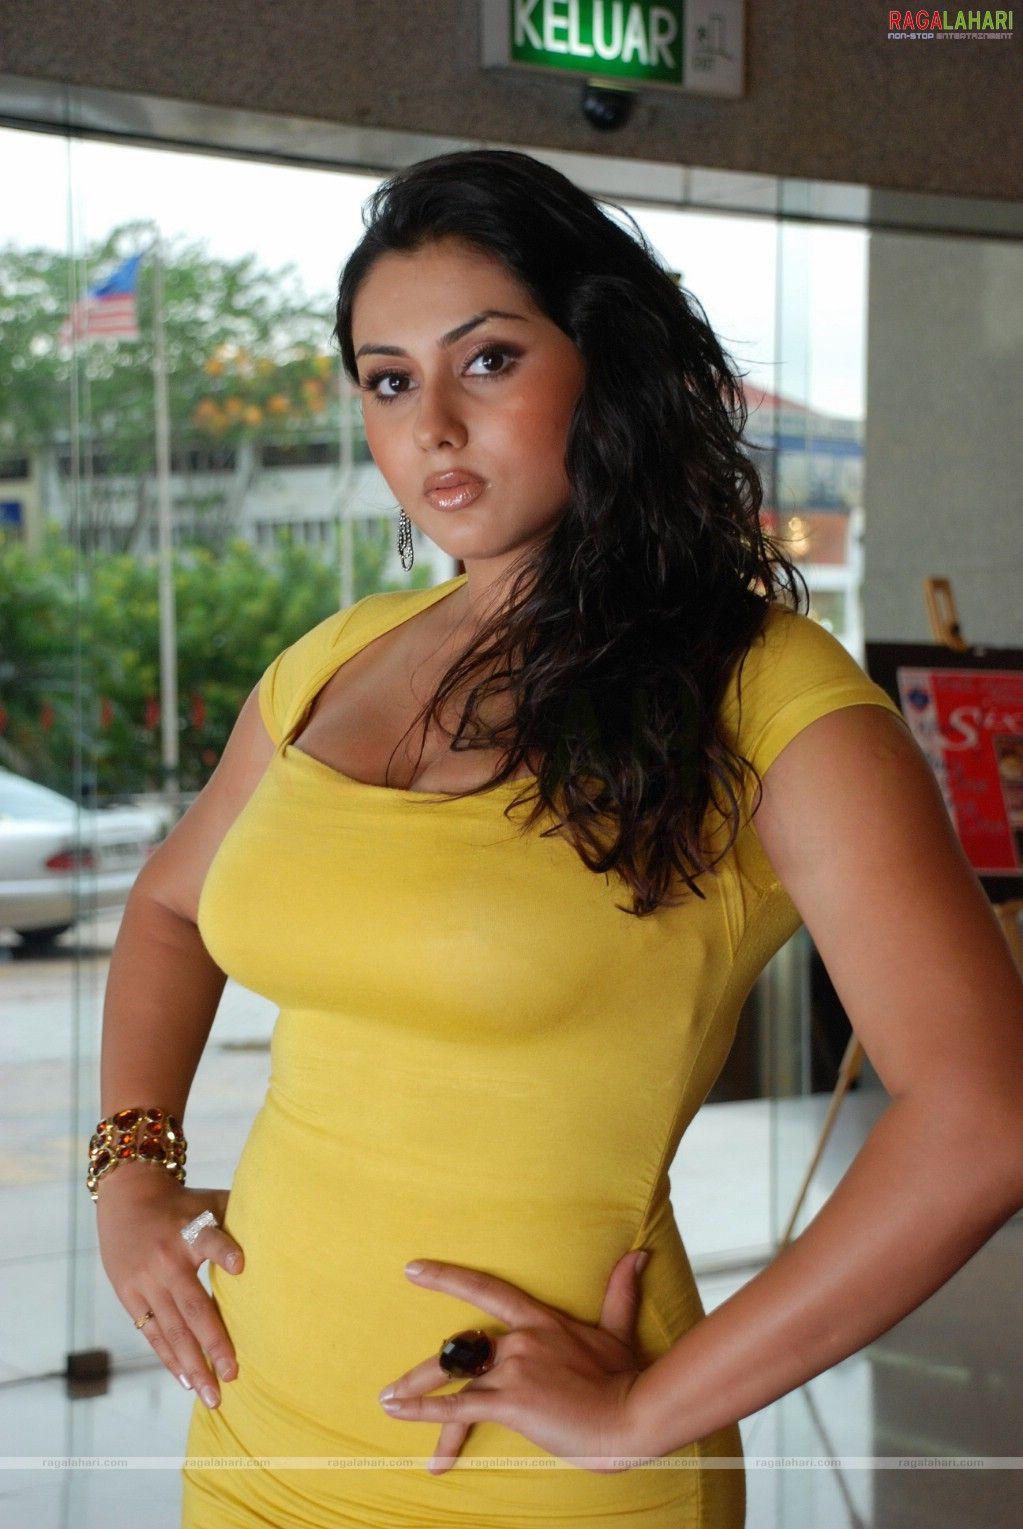 Namitha Hot Photos Bikini Pics Hd Wallpapers Sexy Stills Videos Gallery